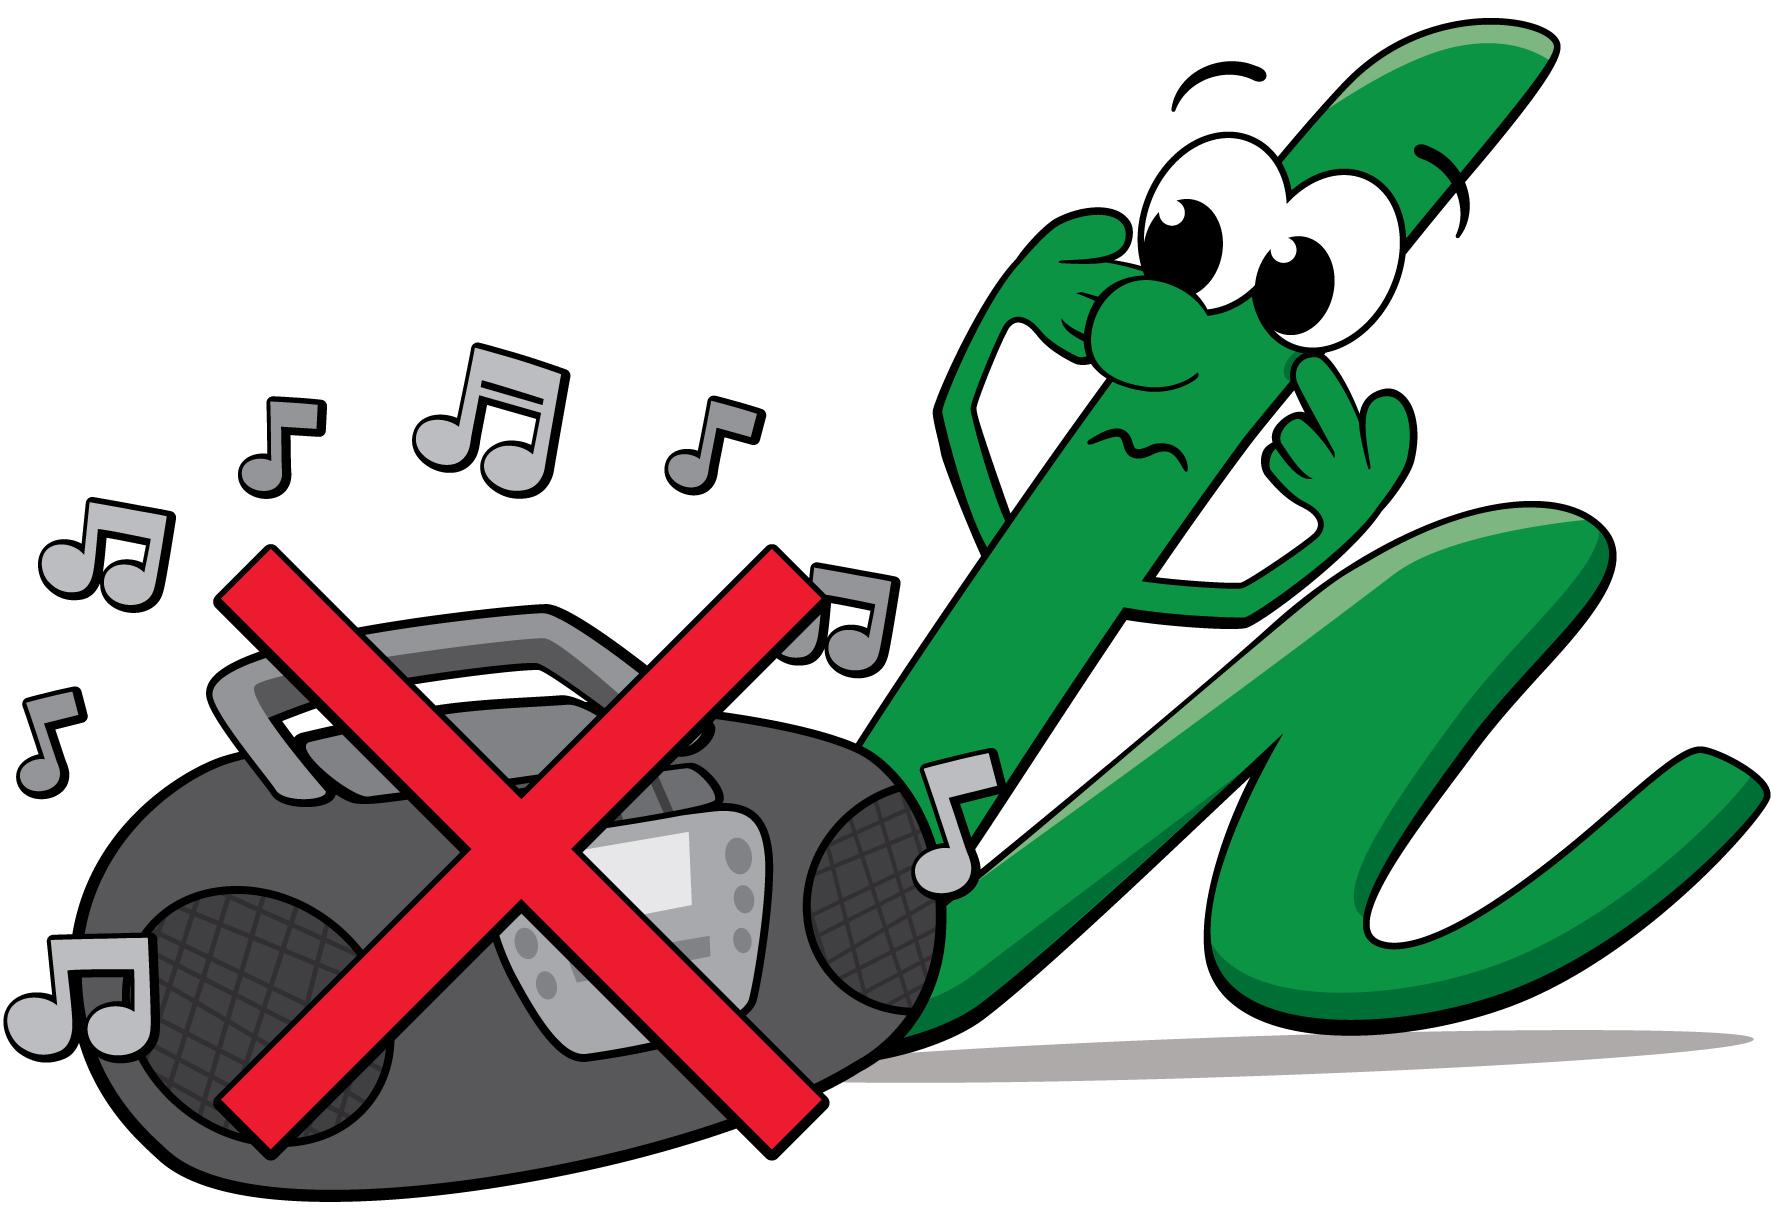 Logo no music allowed